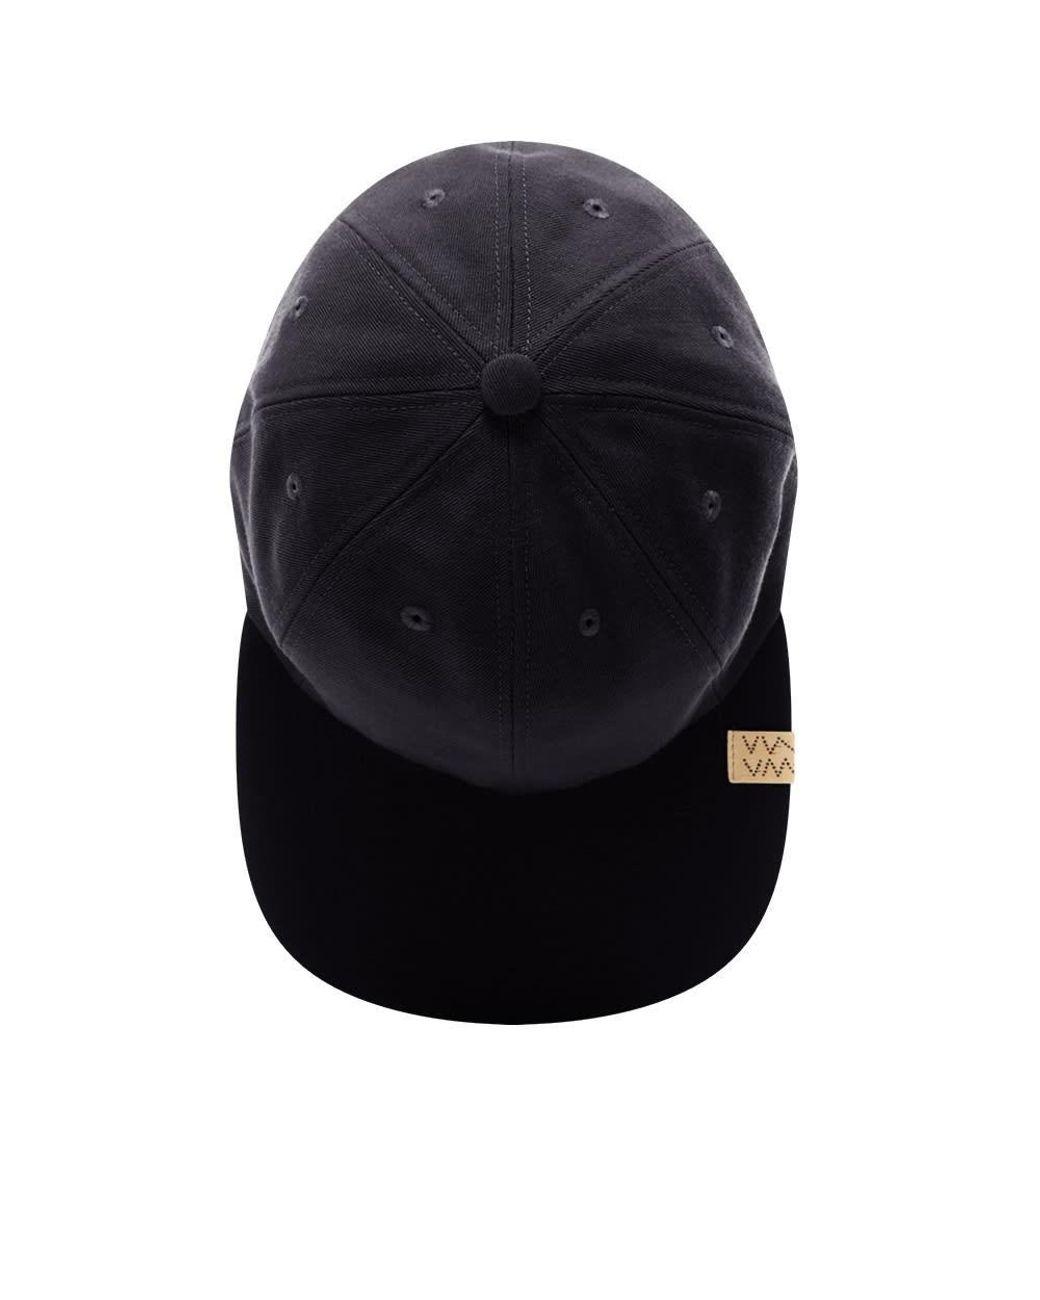 Ralph Lauren RRL Blue Satin Wings Logo Patch Flight Hat Cap New